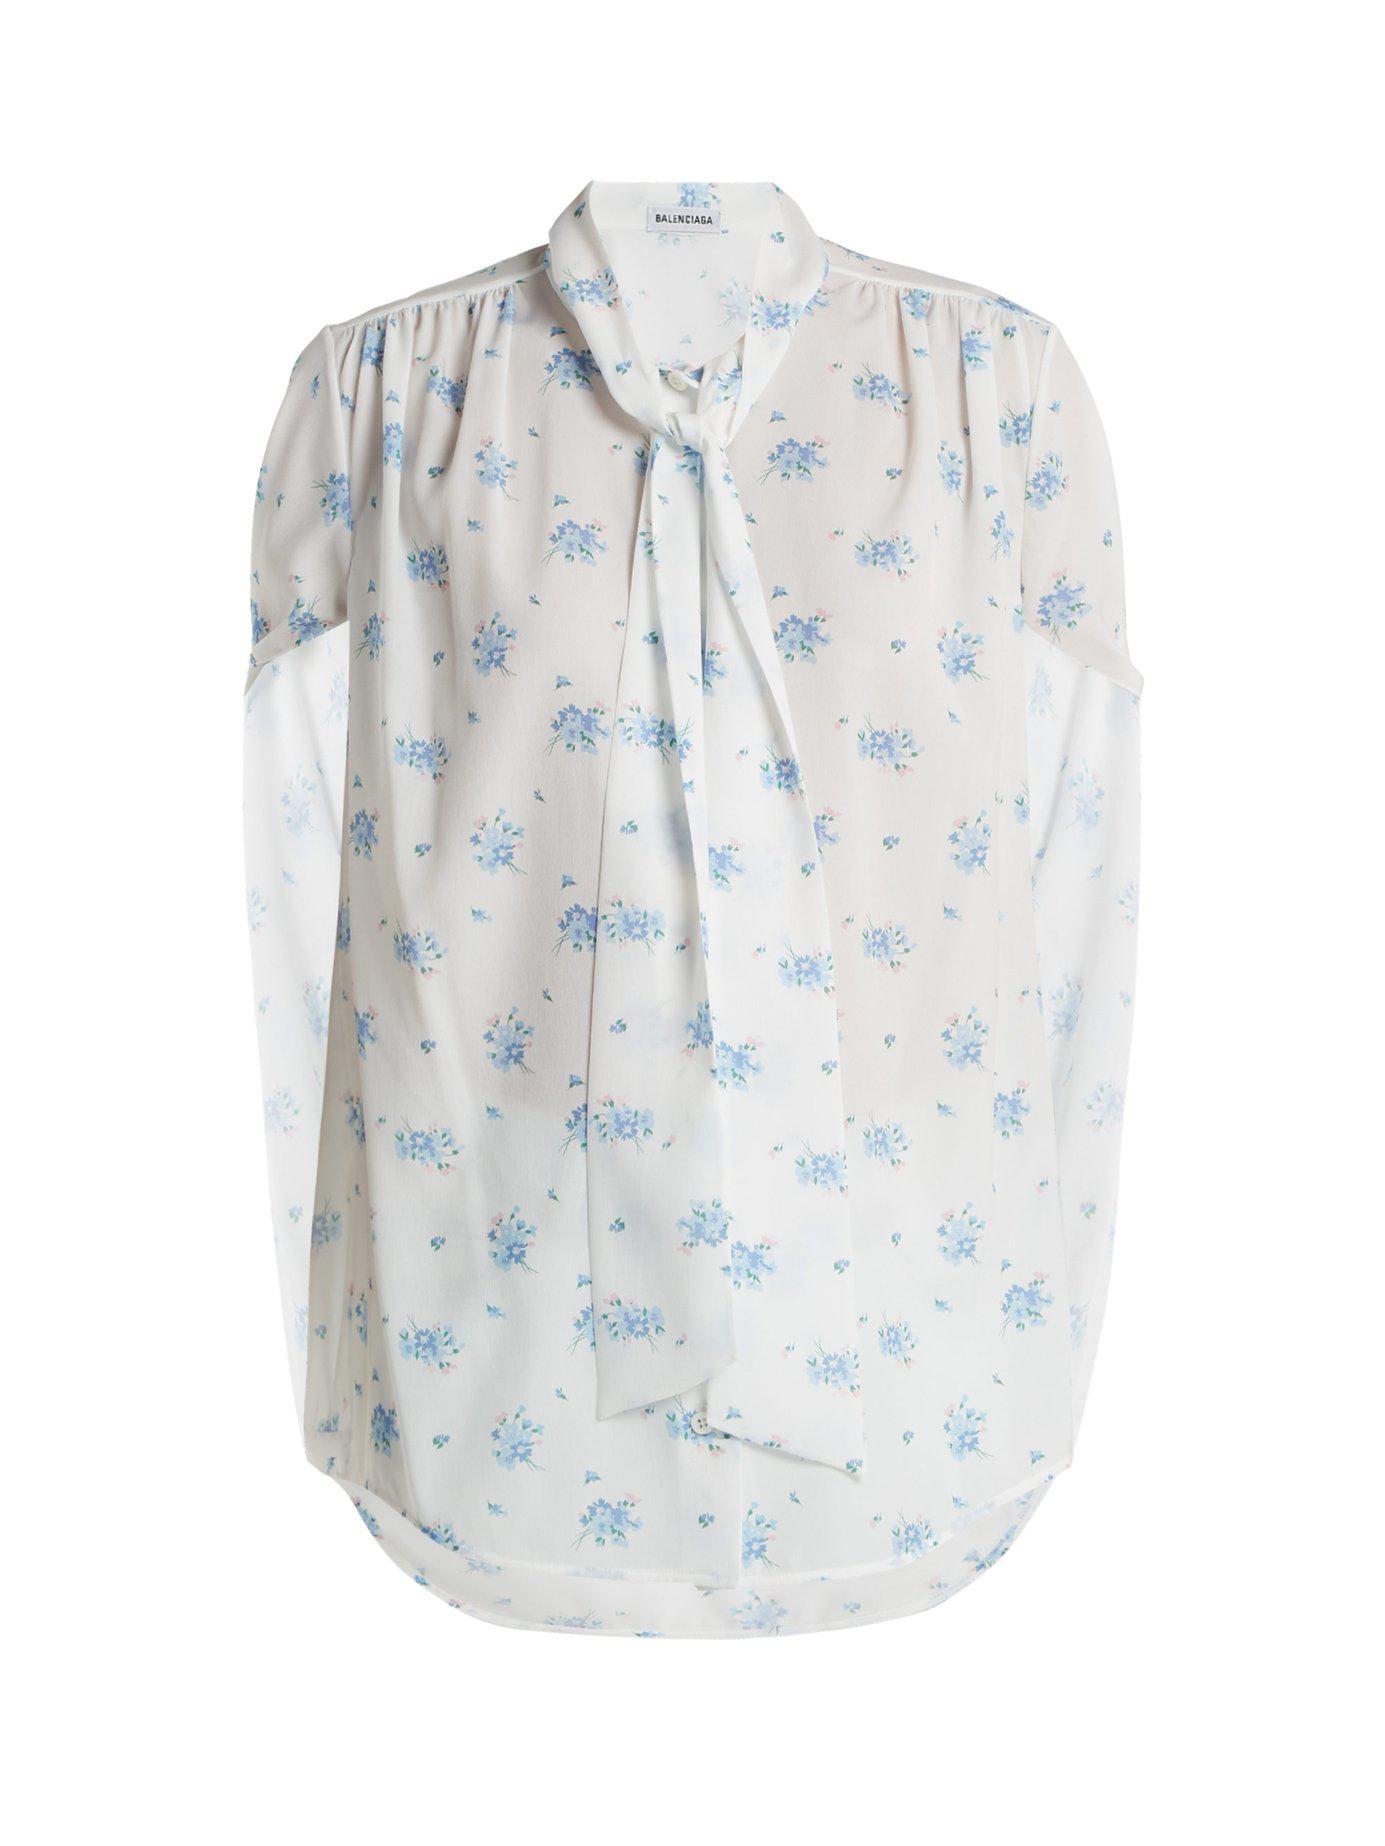 944211ecea60 Balenciaga - Blue Twisted Sleeve Floral Print Crepe Blouse - Lyst. View  fullscreen